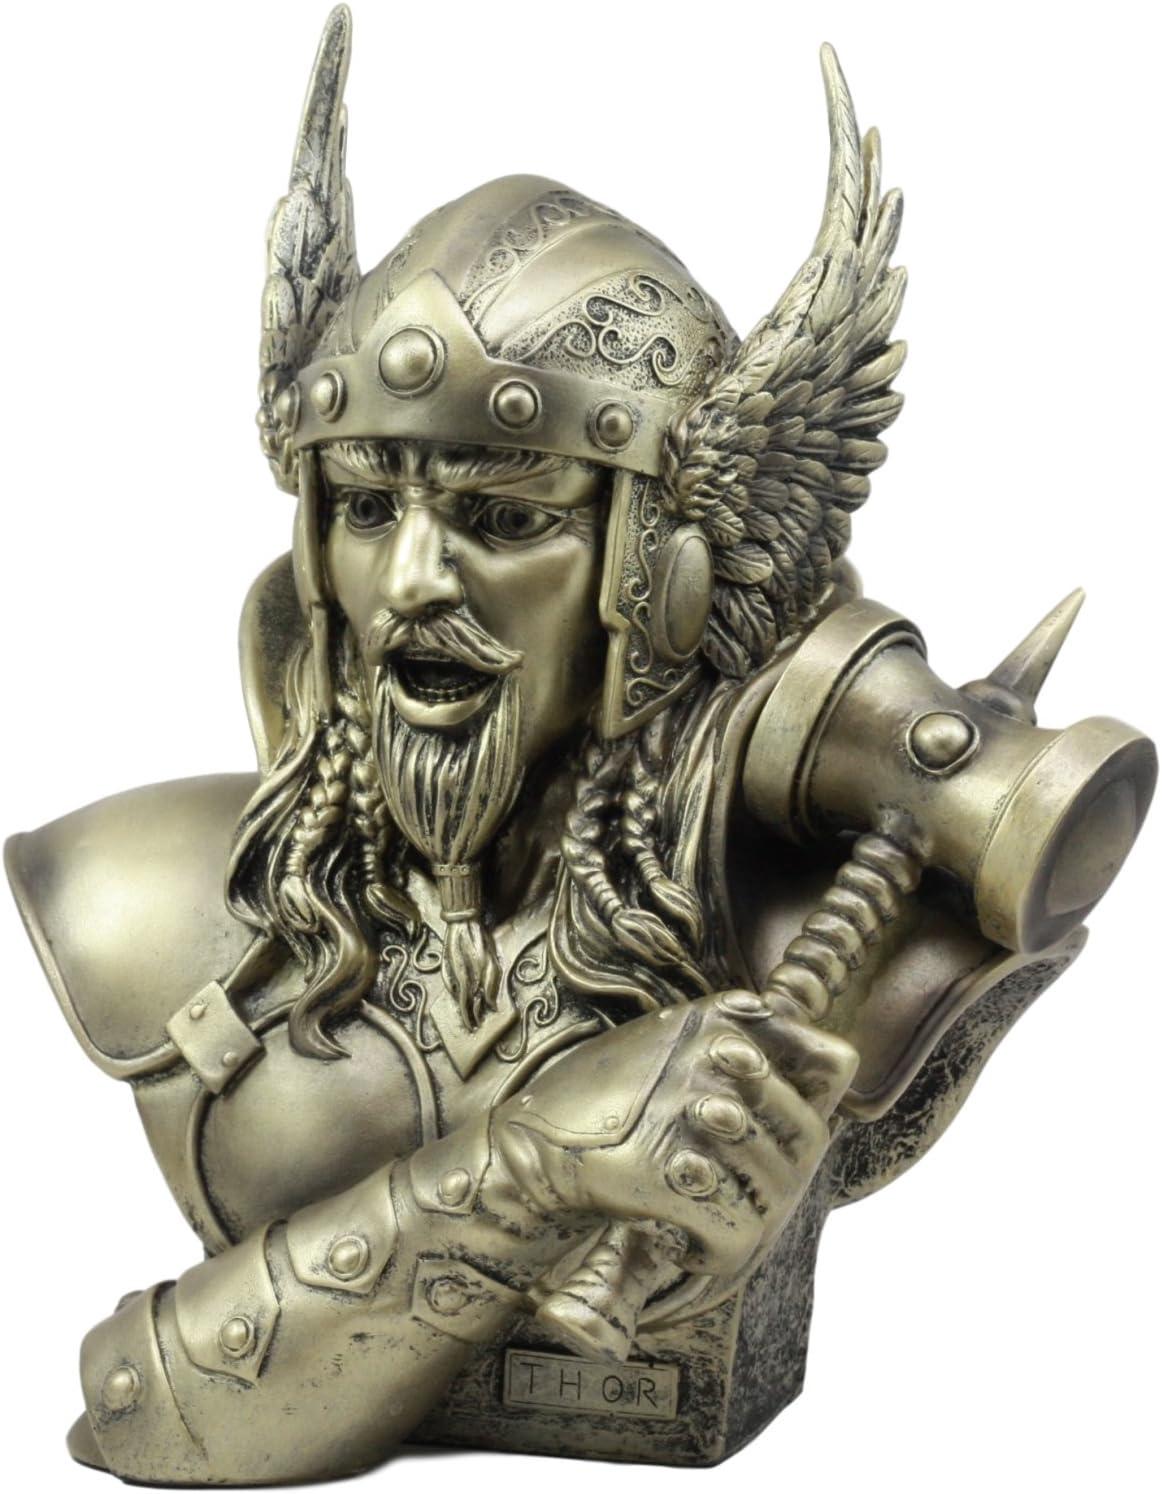 Amazon Com Ebros Large Thor Odinson Wielding Mjolnir Hammer Bust Statue 11 Tall Norse Mythology God Of Thunder Lightning Mjolnir Hammer Donar Son Of Odin Asgard Ruler Home Kitchen